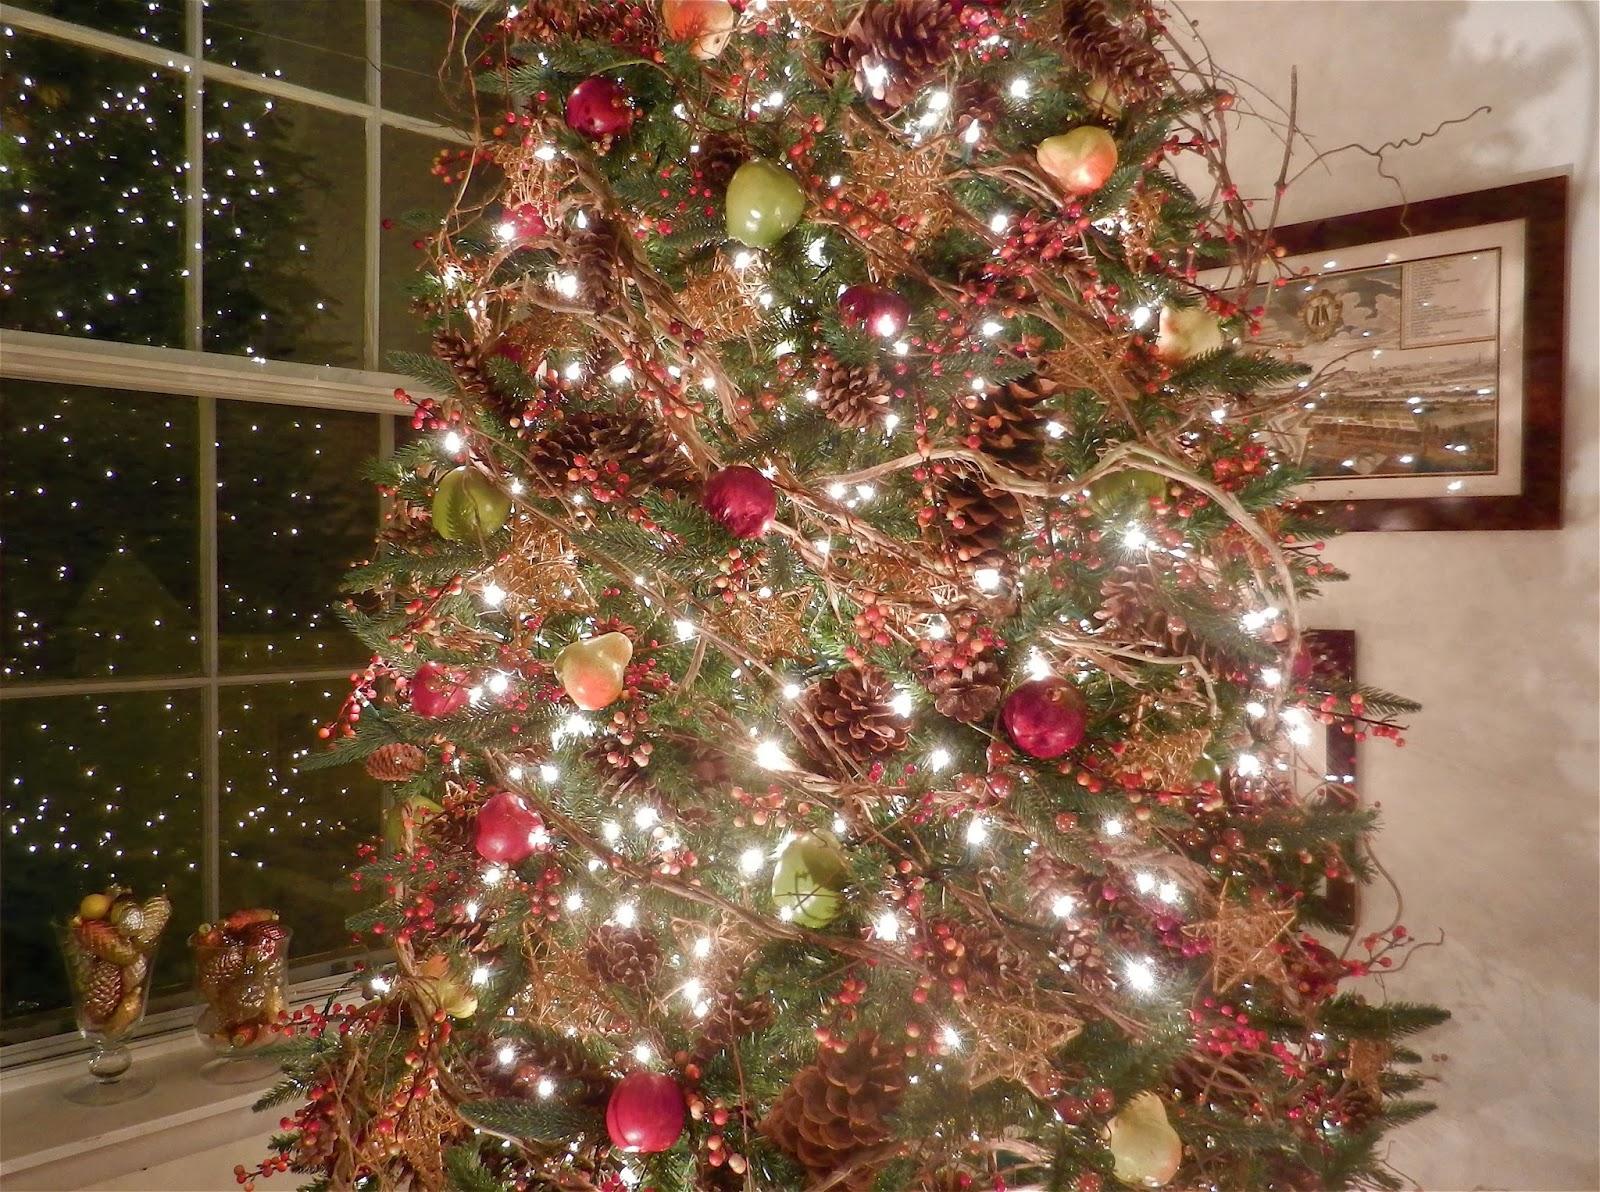 Knickerbocker Style & Design: An Elegant Nature-Inspired Christmas ...